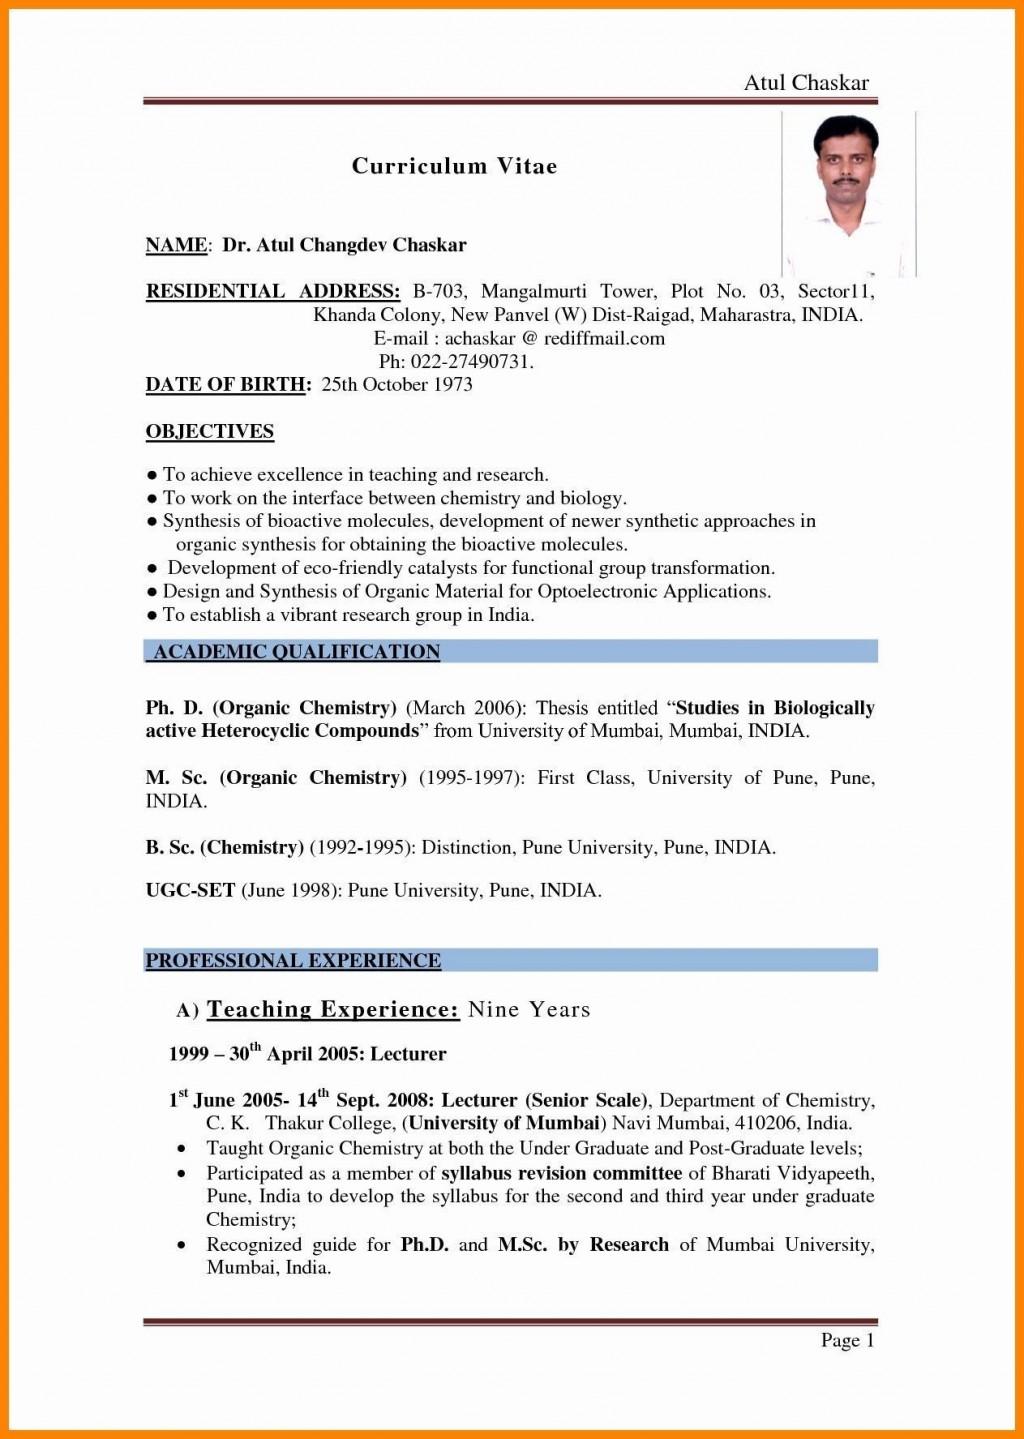 001 Beautiful Resume Sample For Teaching Job In India Image  School Principal PositionLarge